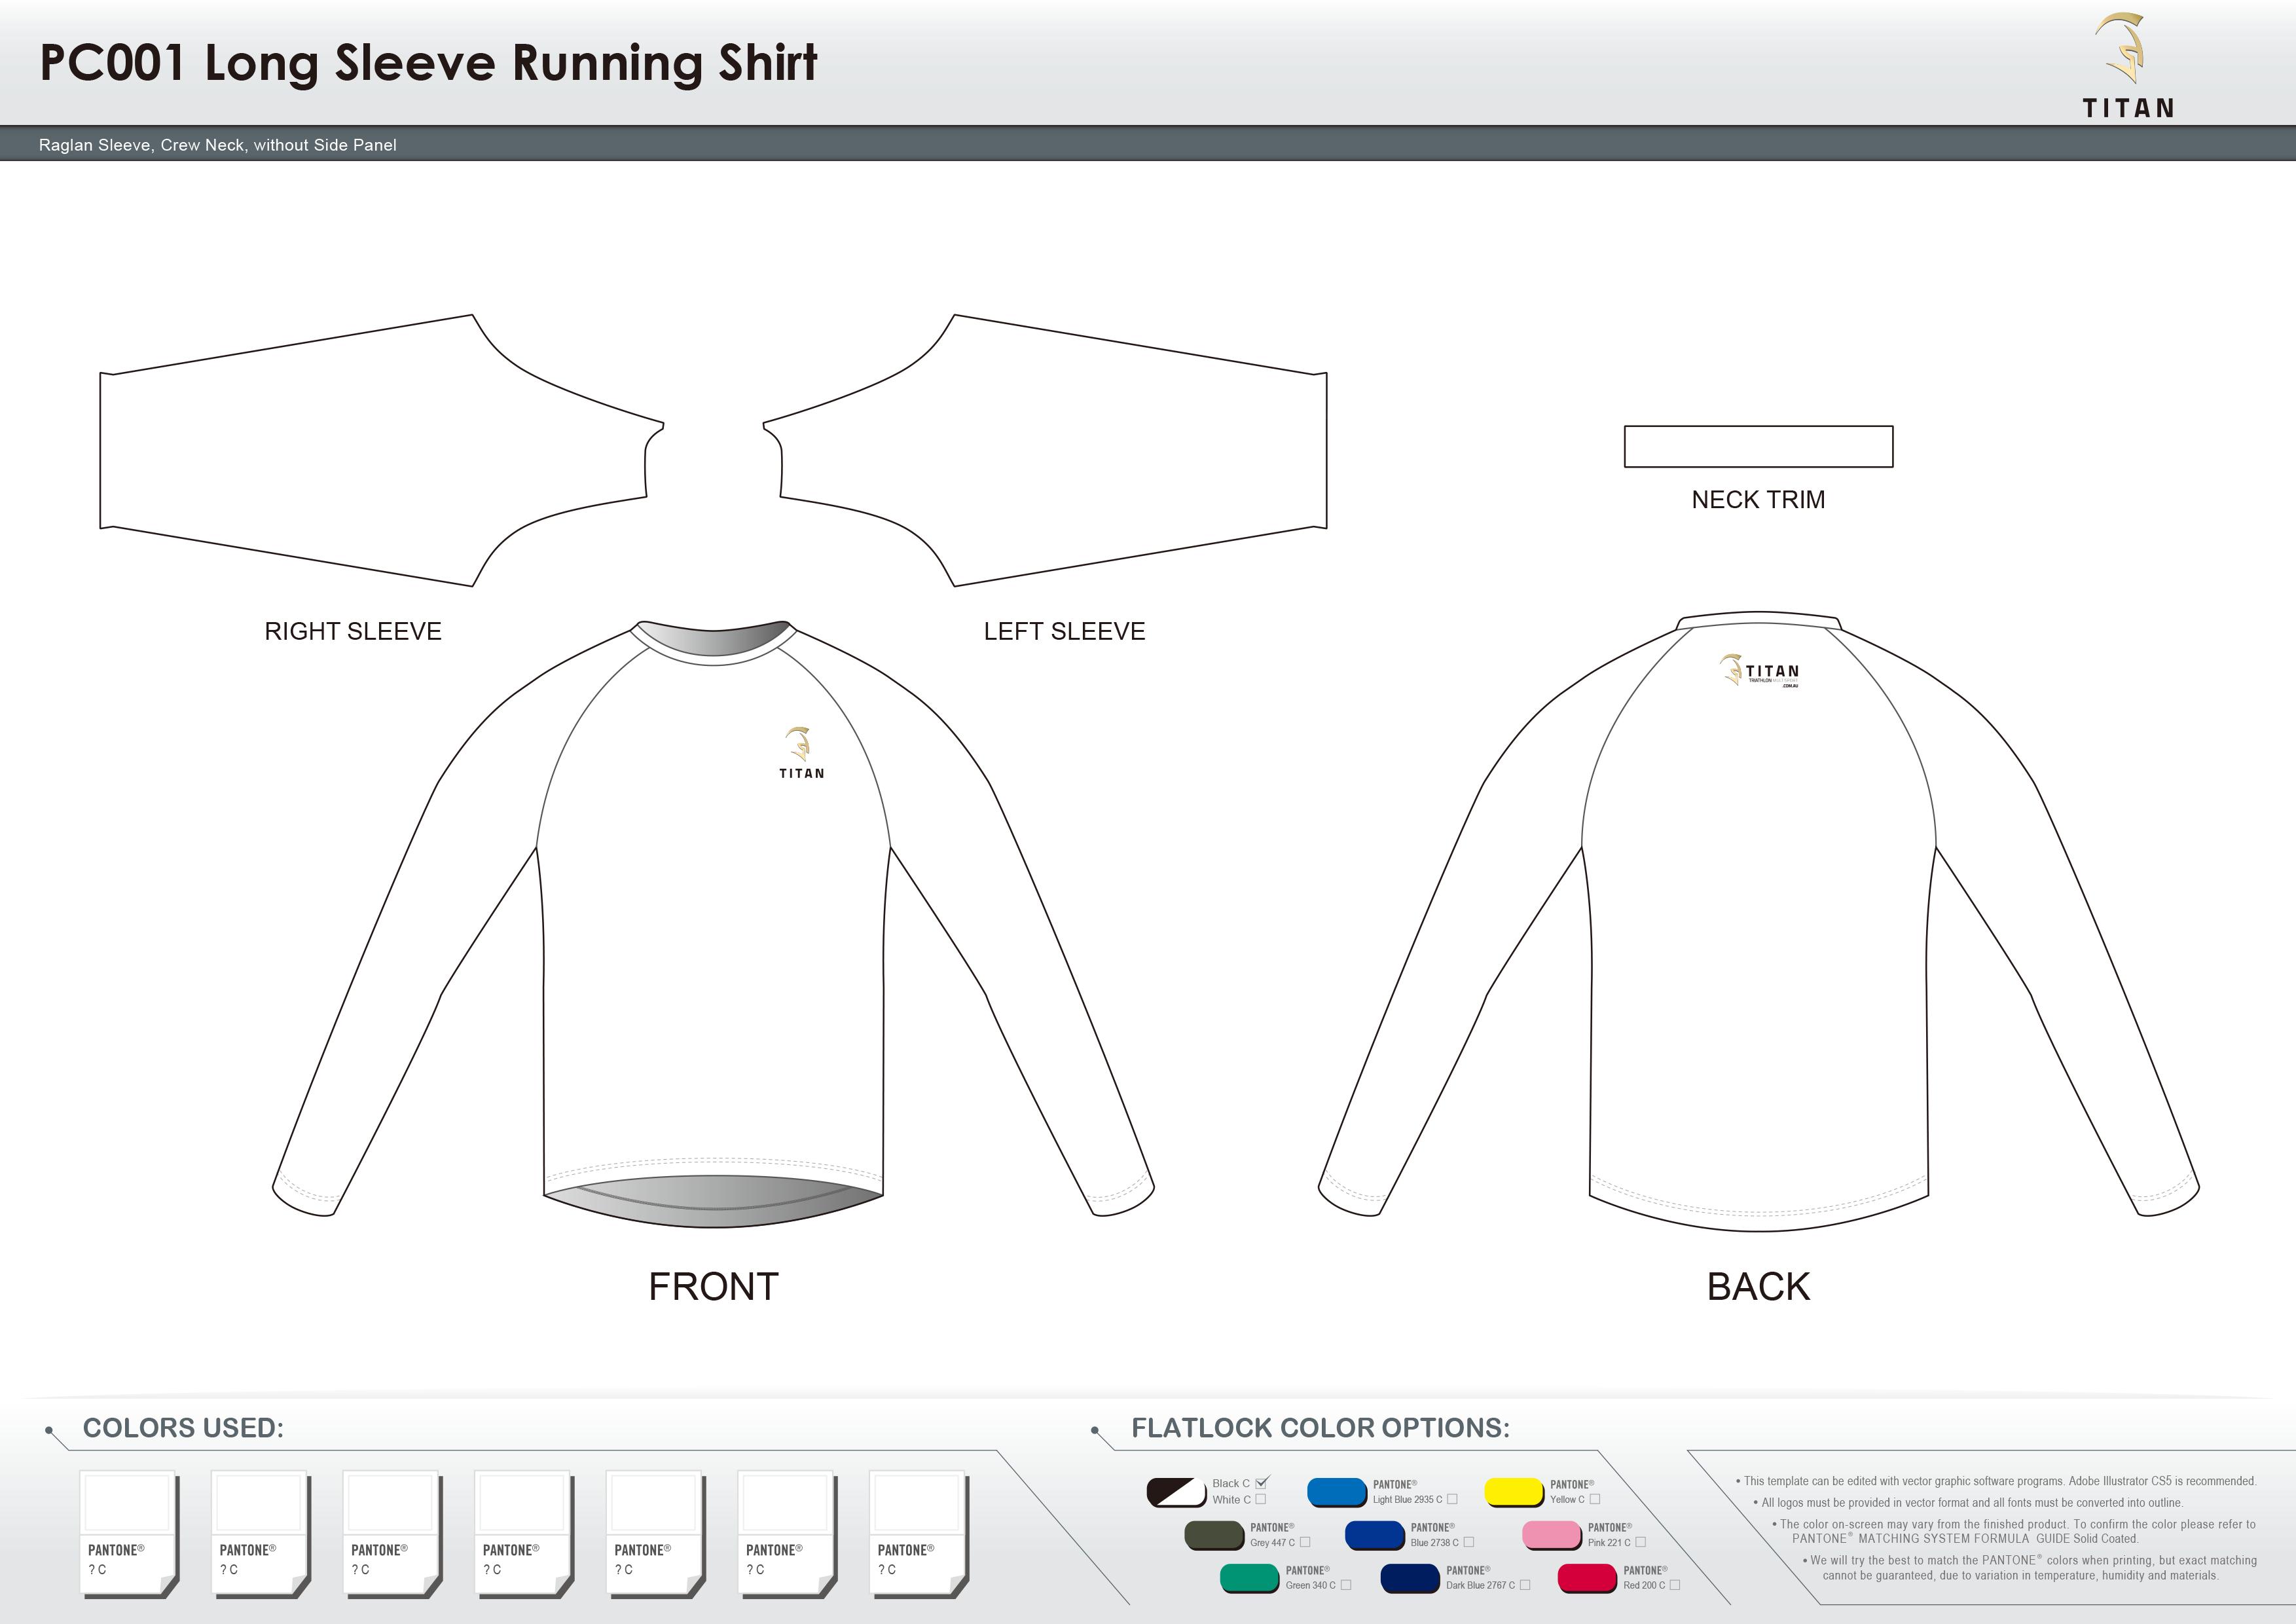 PC001 Long Sleeve Running Shirt